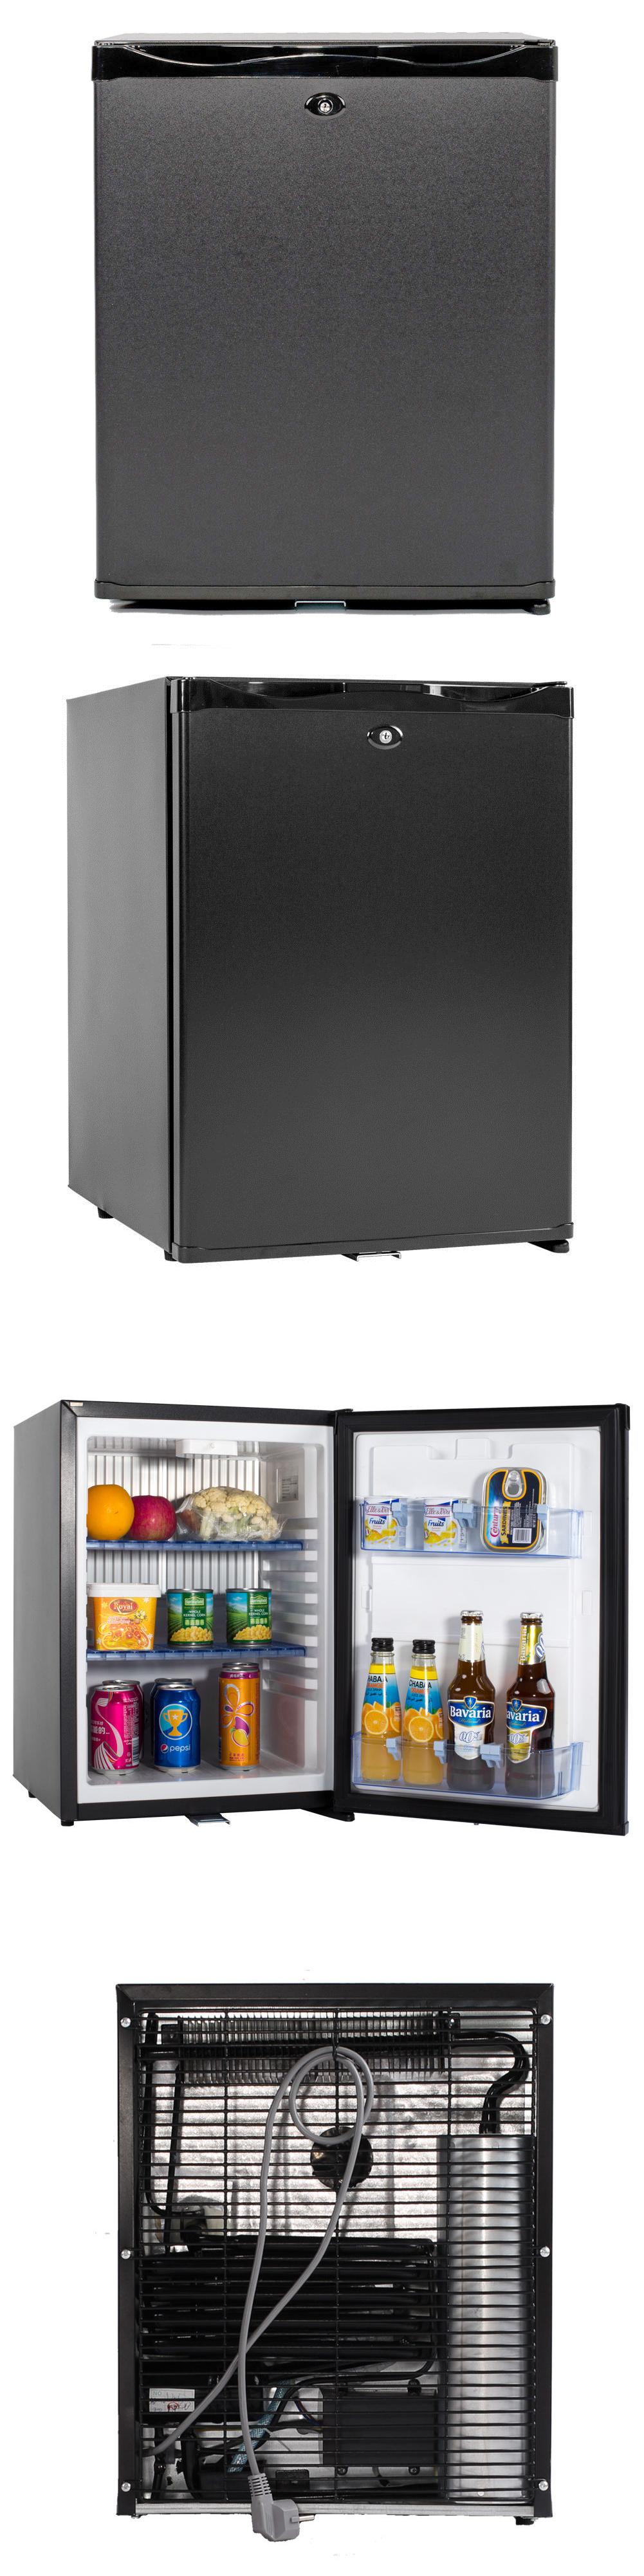 Uncategorized 12 Volt Kitchen Appliances 12 volt portable appliances 110v 12v 40l mini fridge rv bar cooler